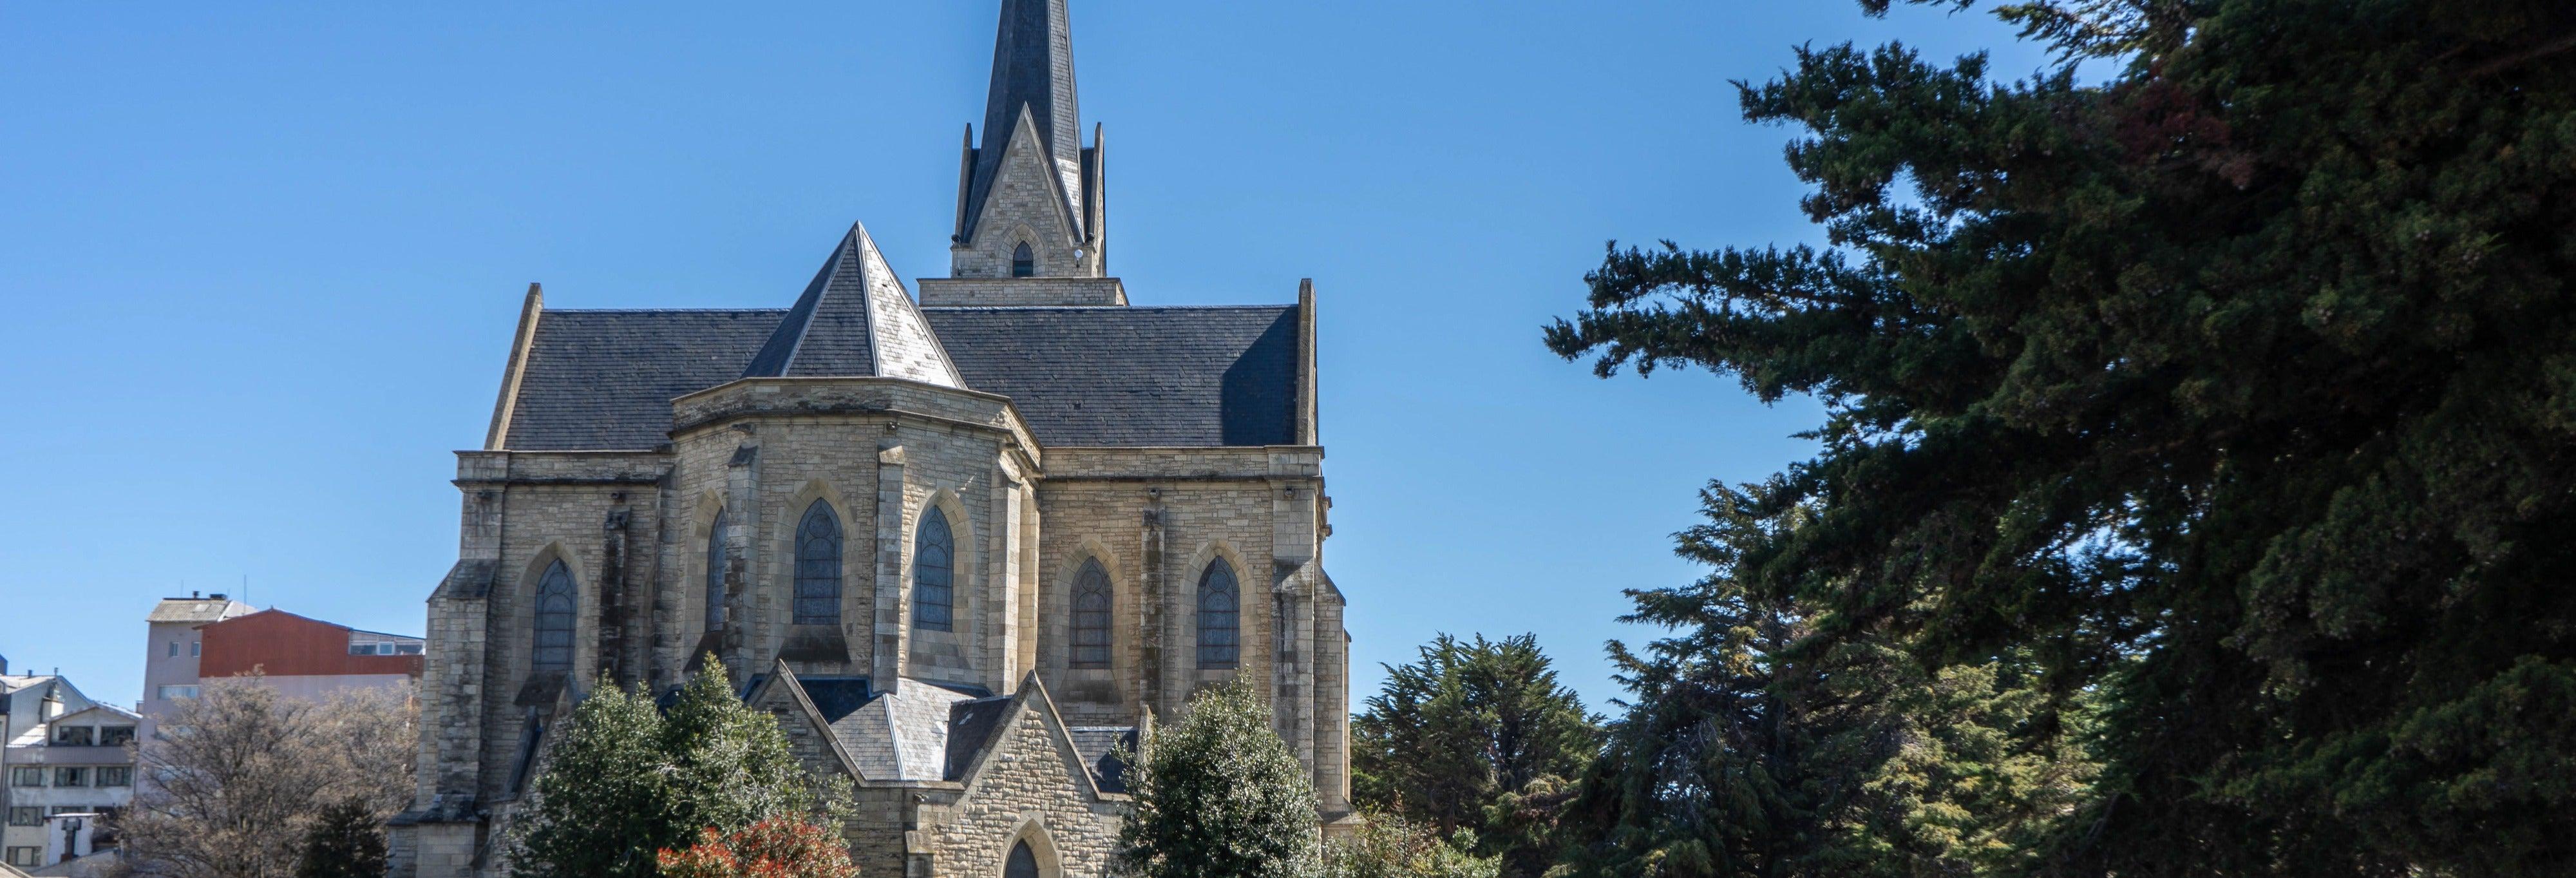 Bariloche Viewpoints Tour